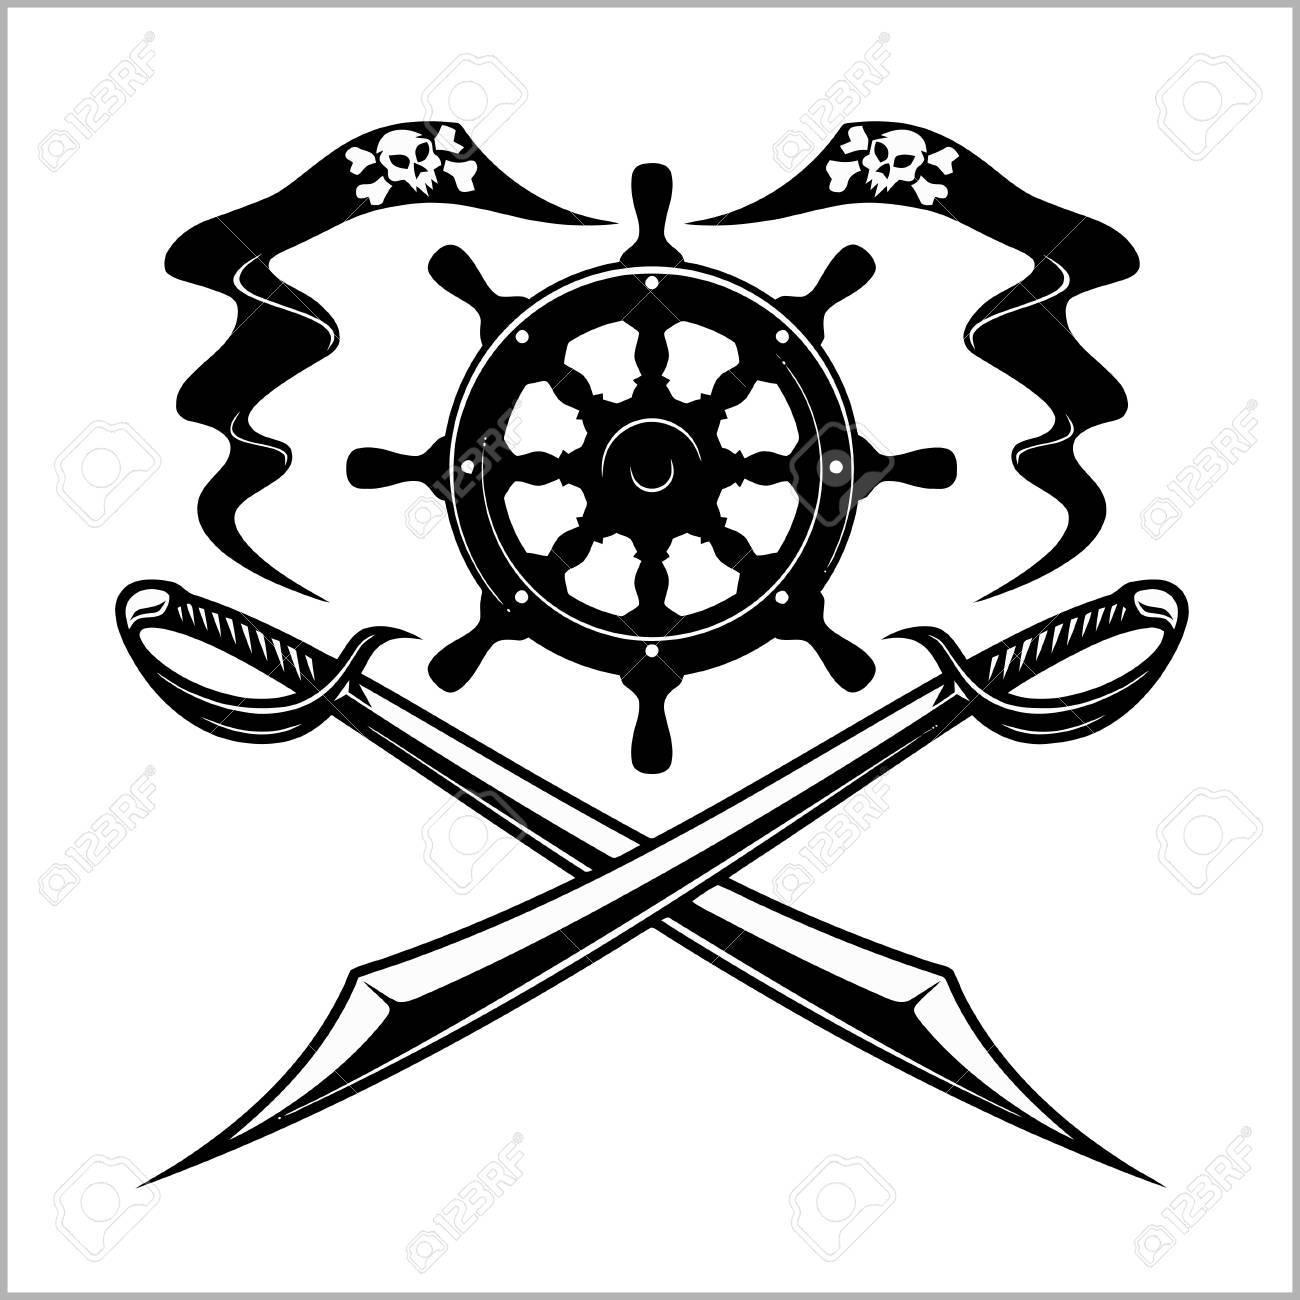 Pirates emblem.